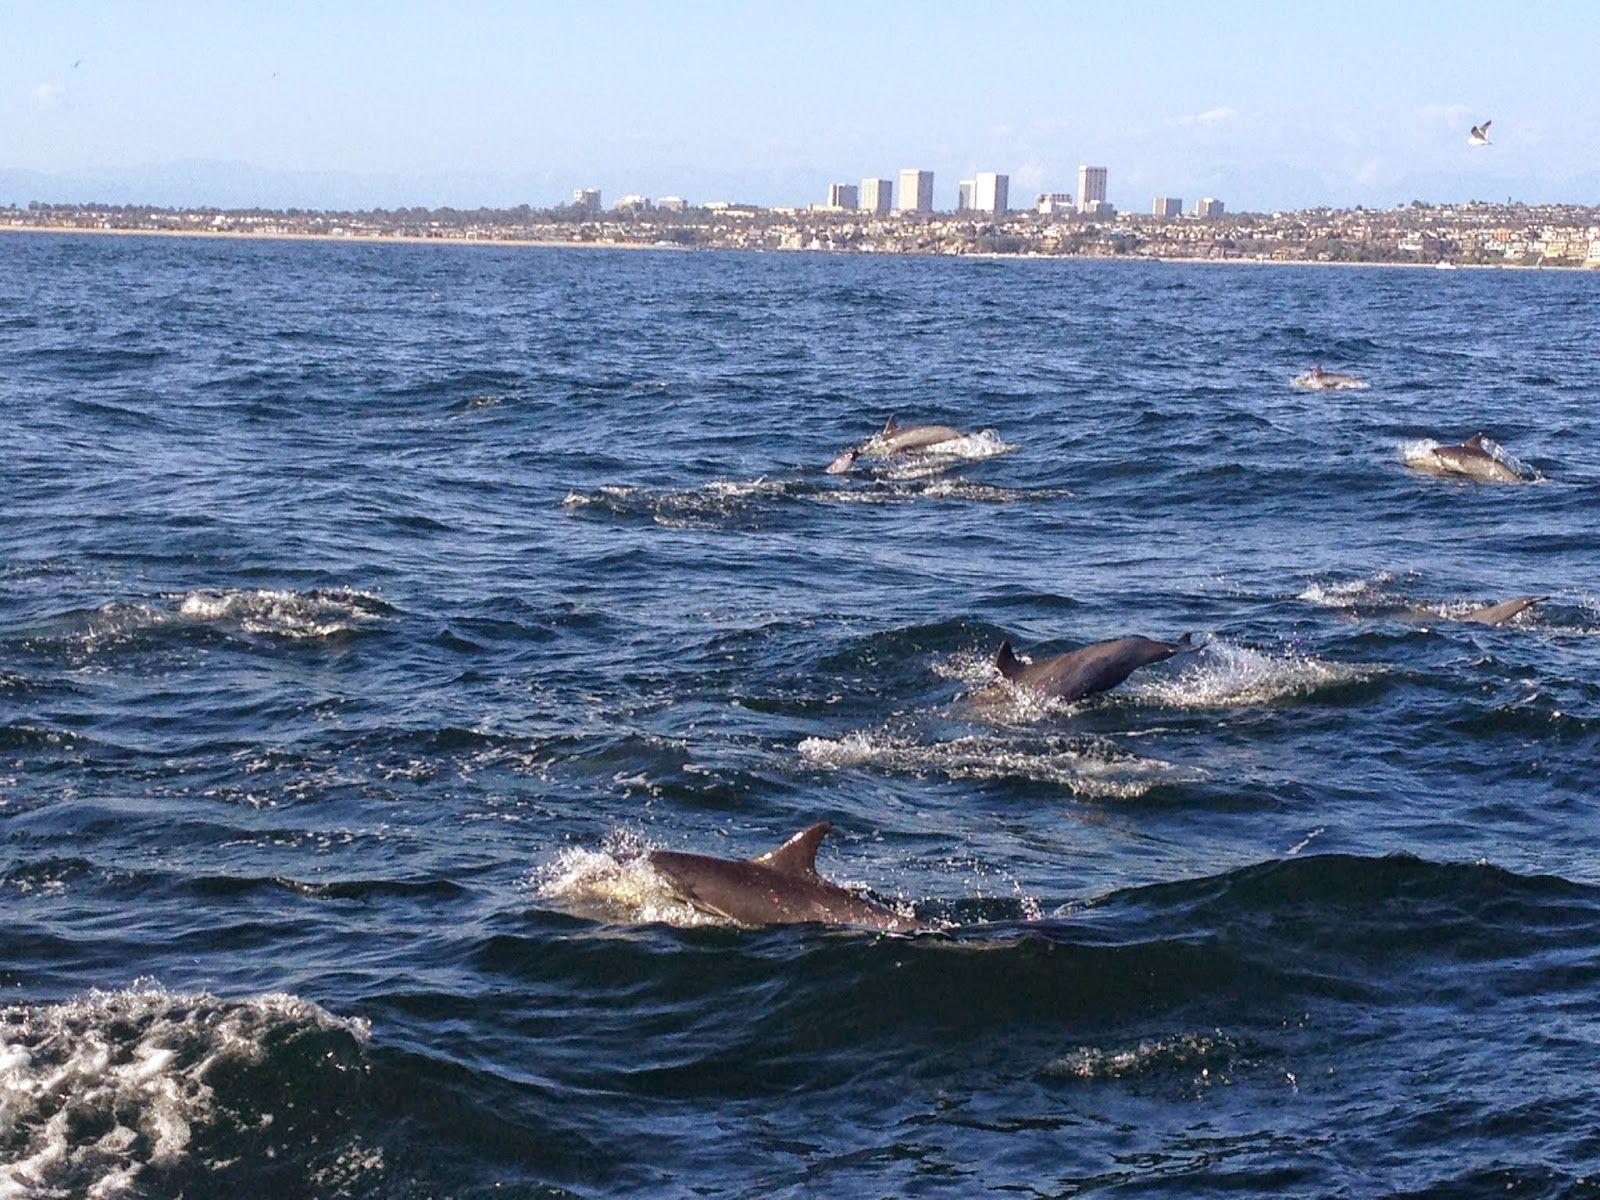 Whale Watching in Newport Beach #NewportBeach #Ca #dolphins